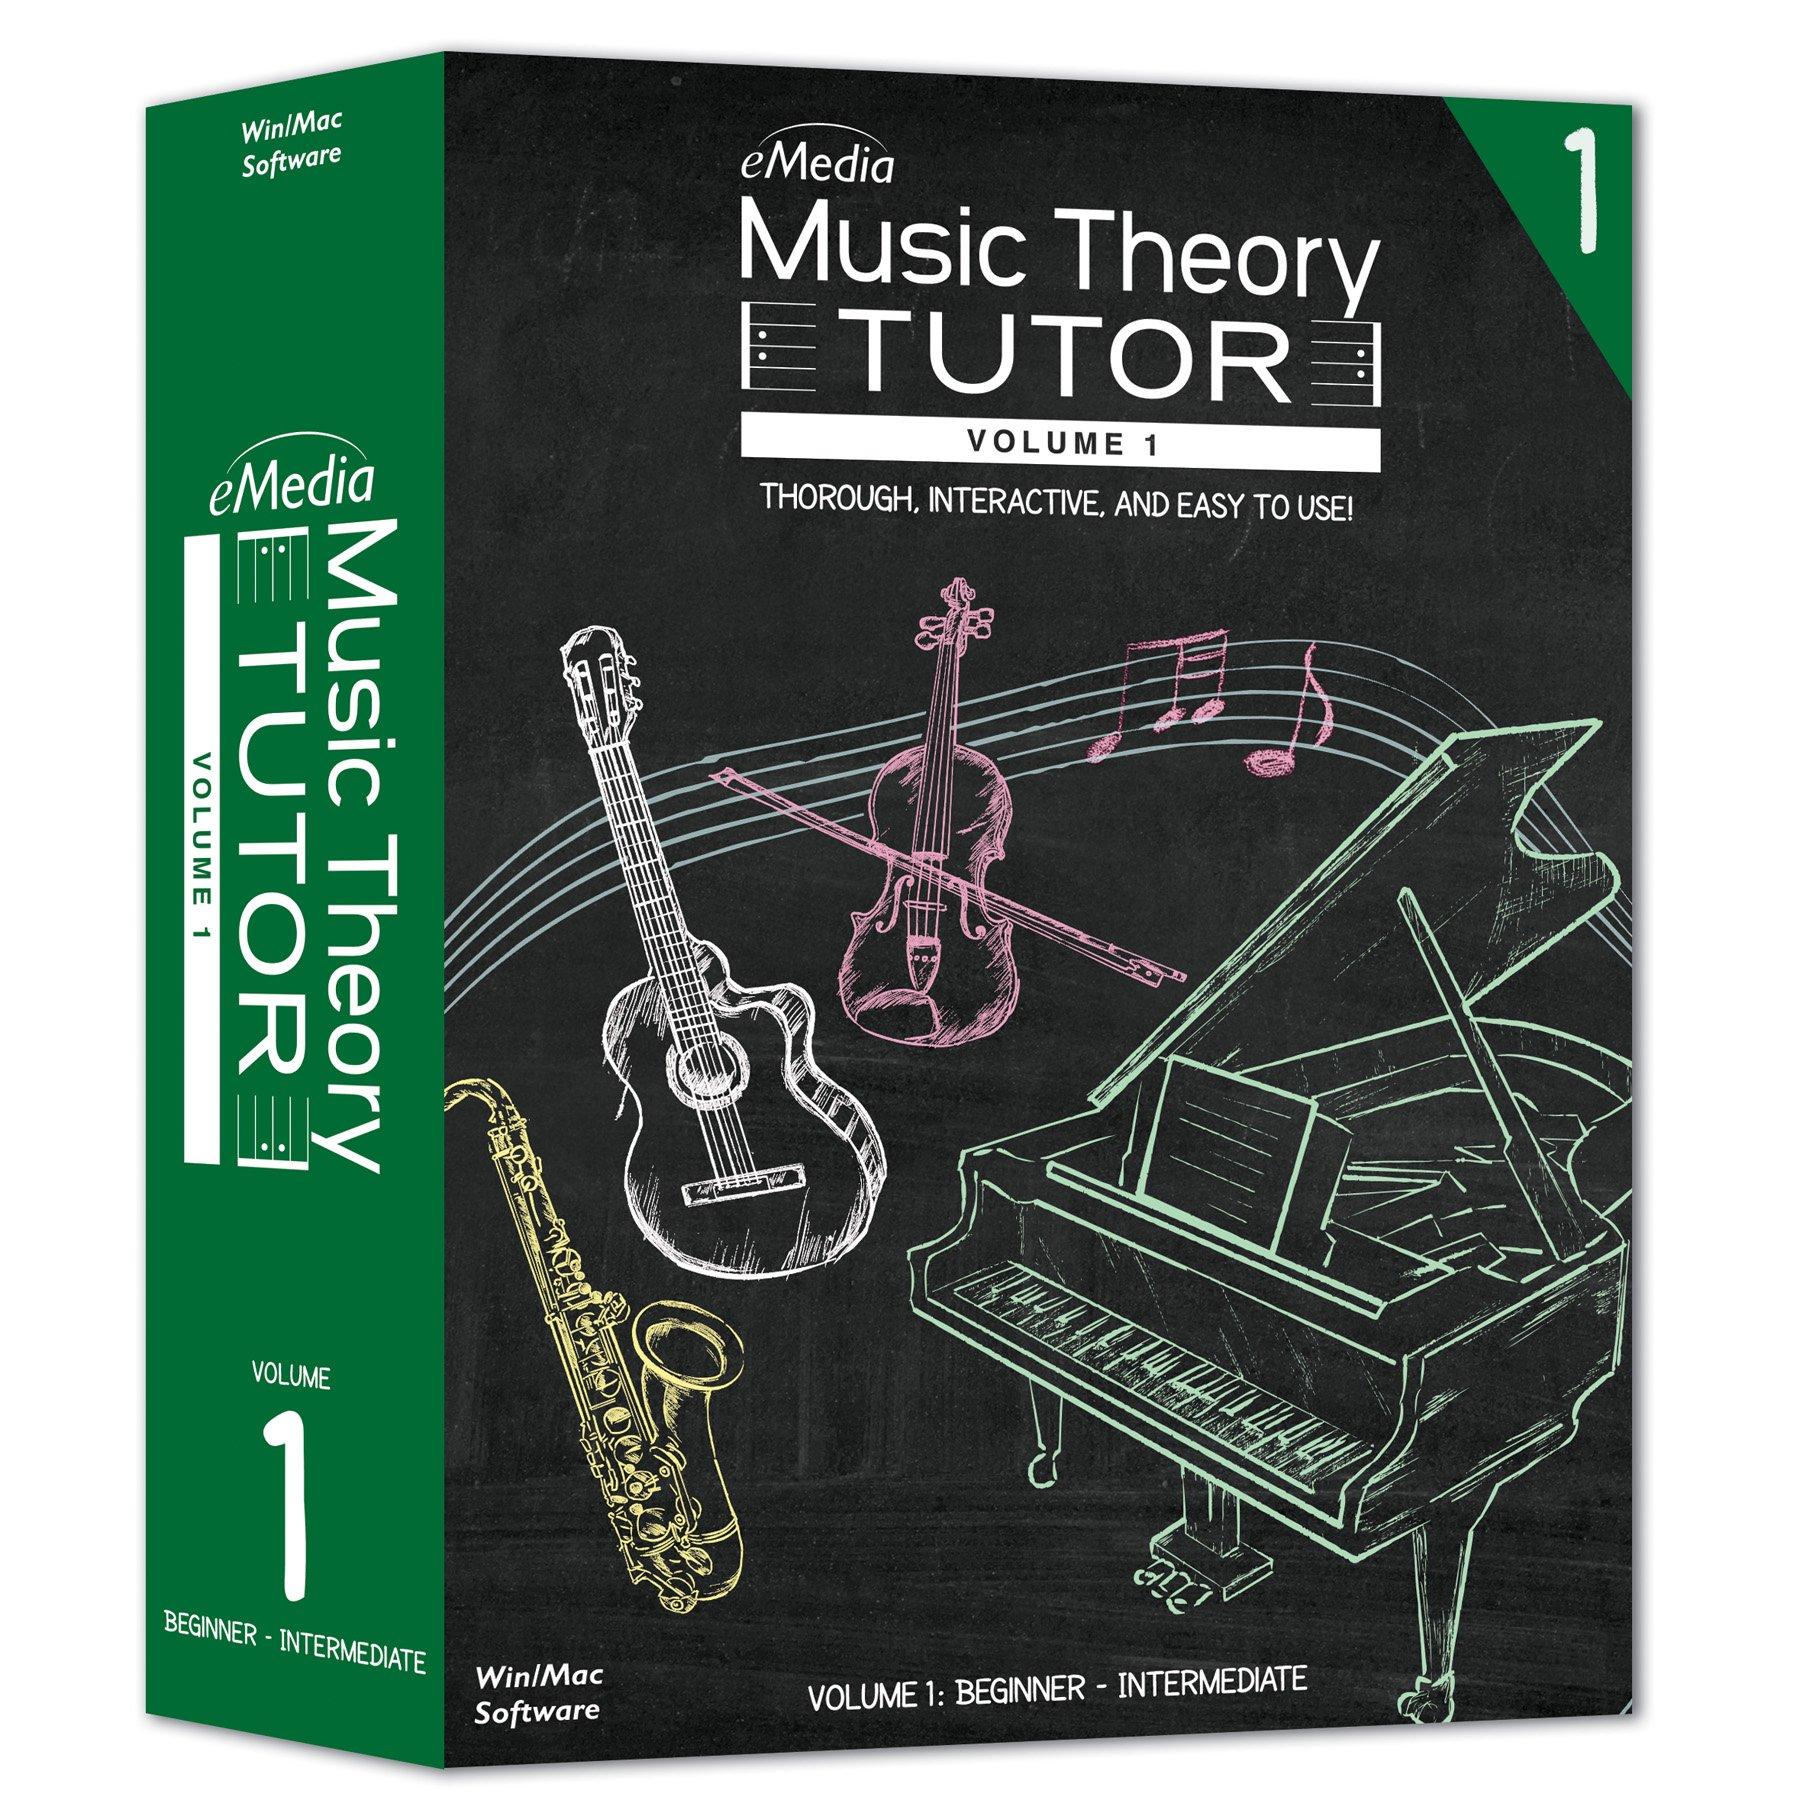 eMedia Music Theory Tutor, Volume 1 by eMedia